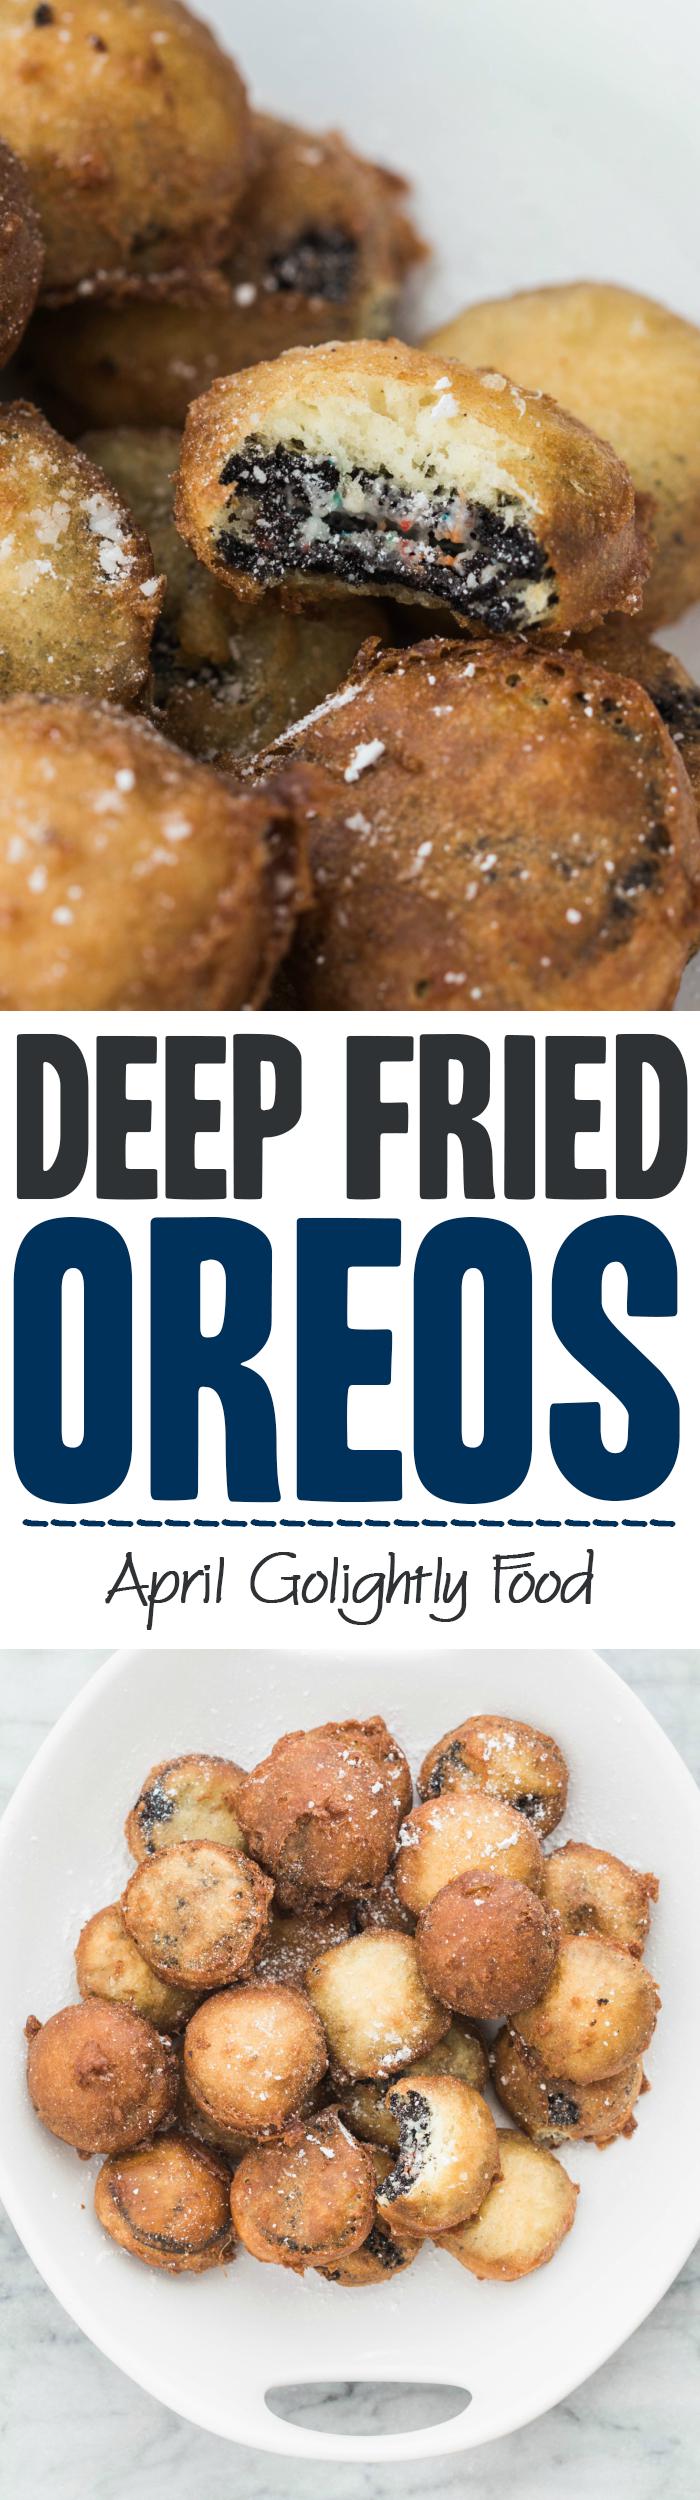 Oreo Funnel Cake Recipe